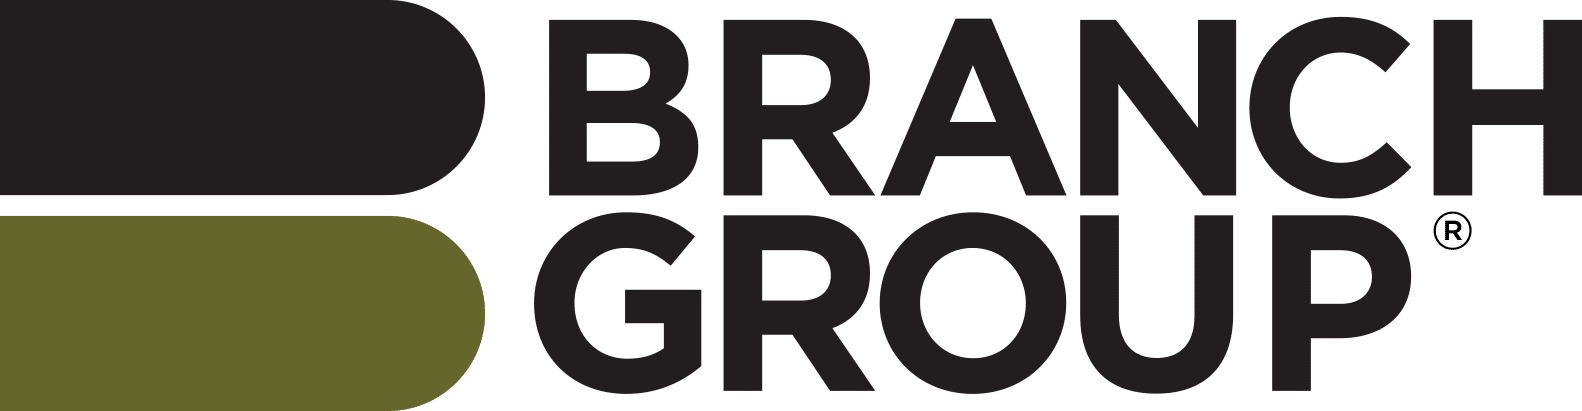 Branch Group logo